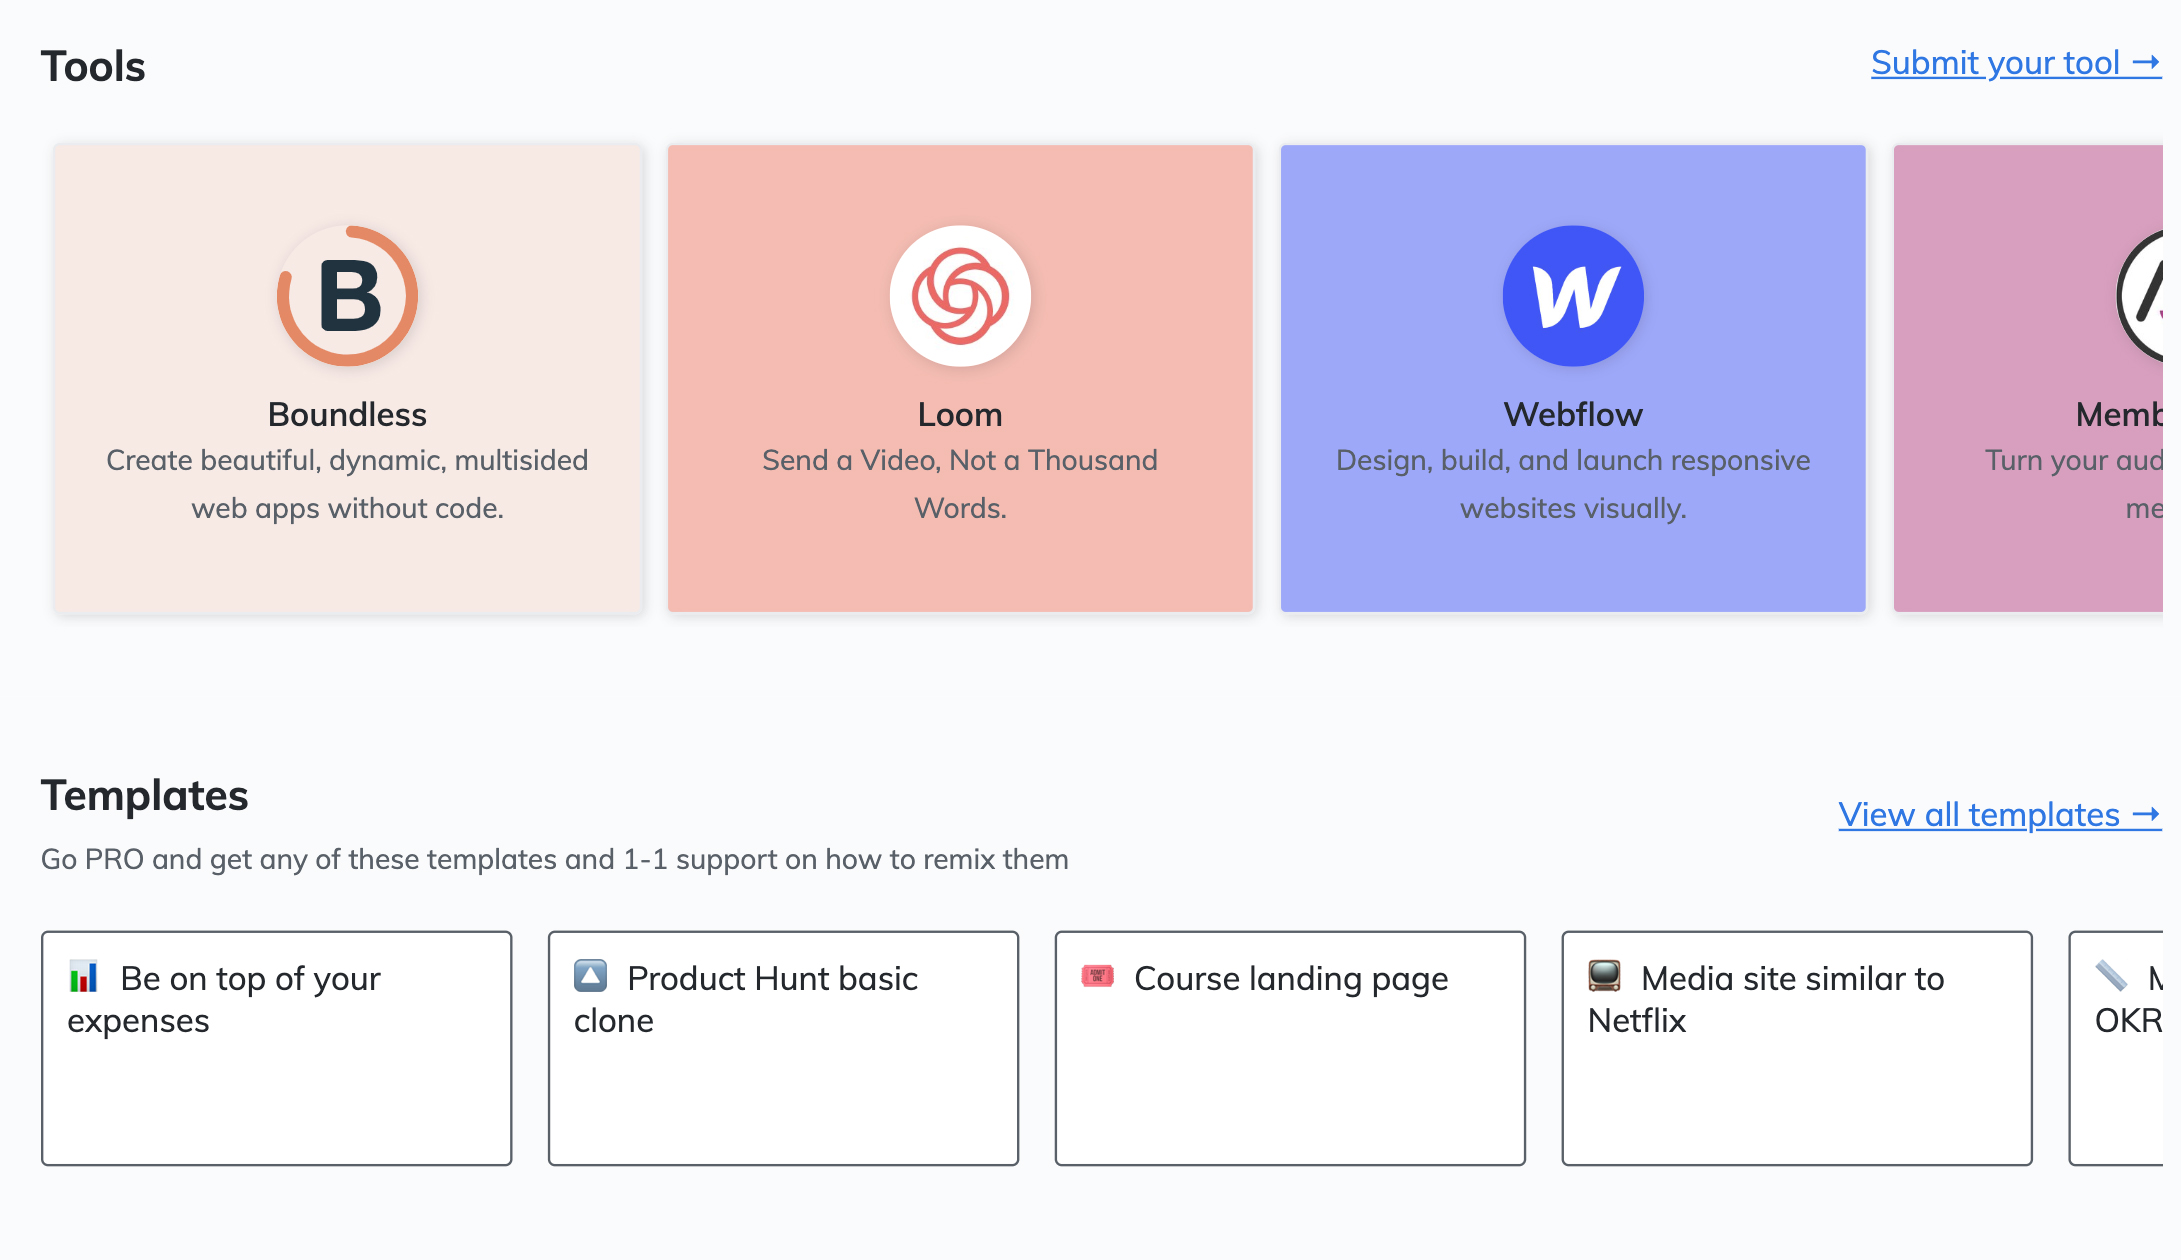 Makerpad tools and templates